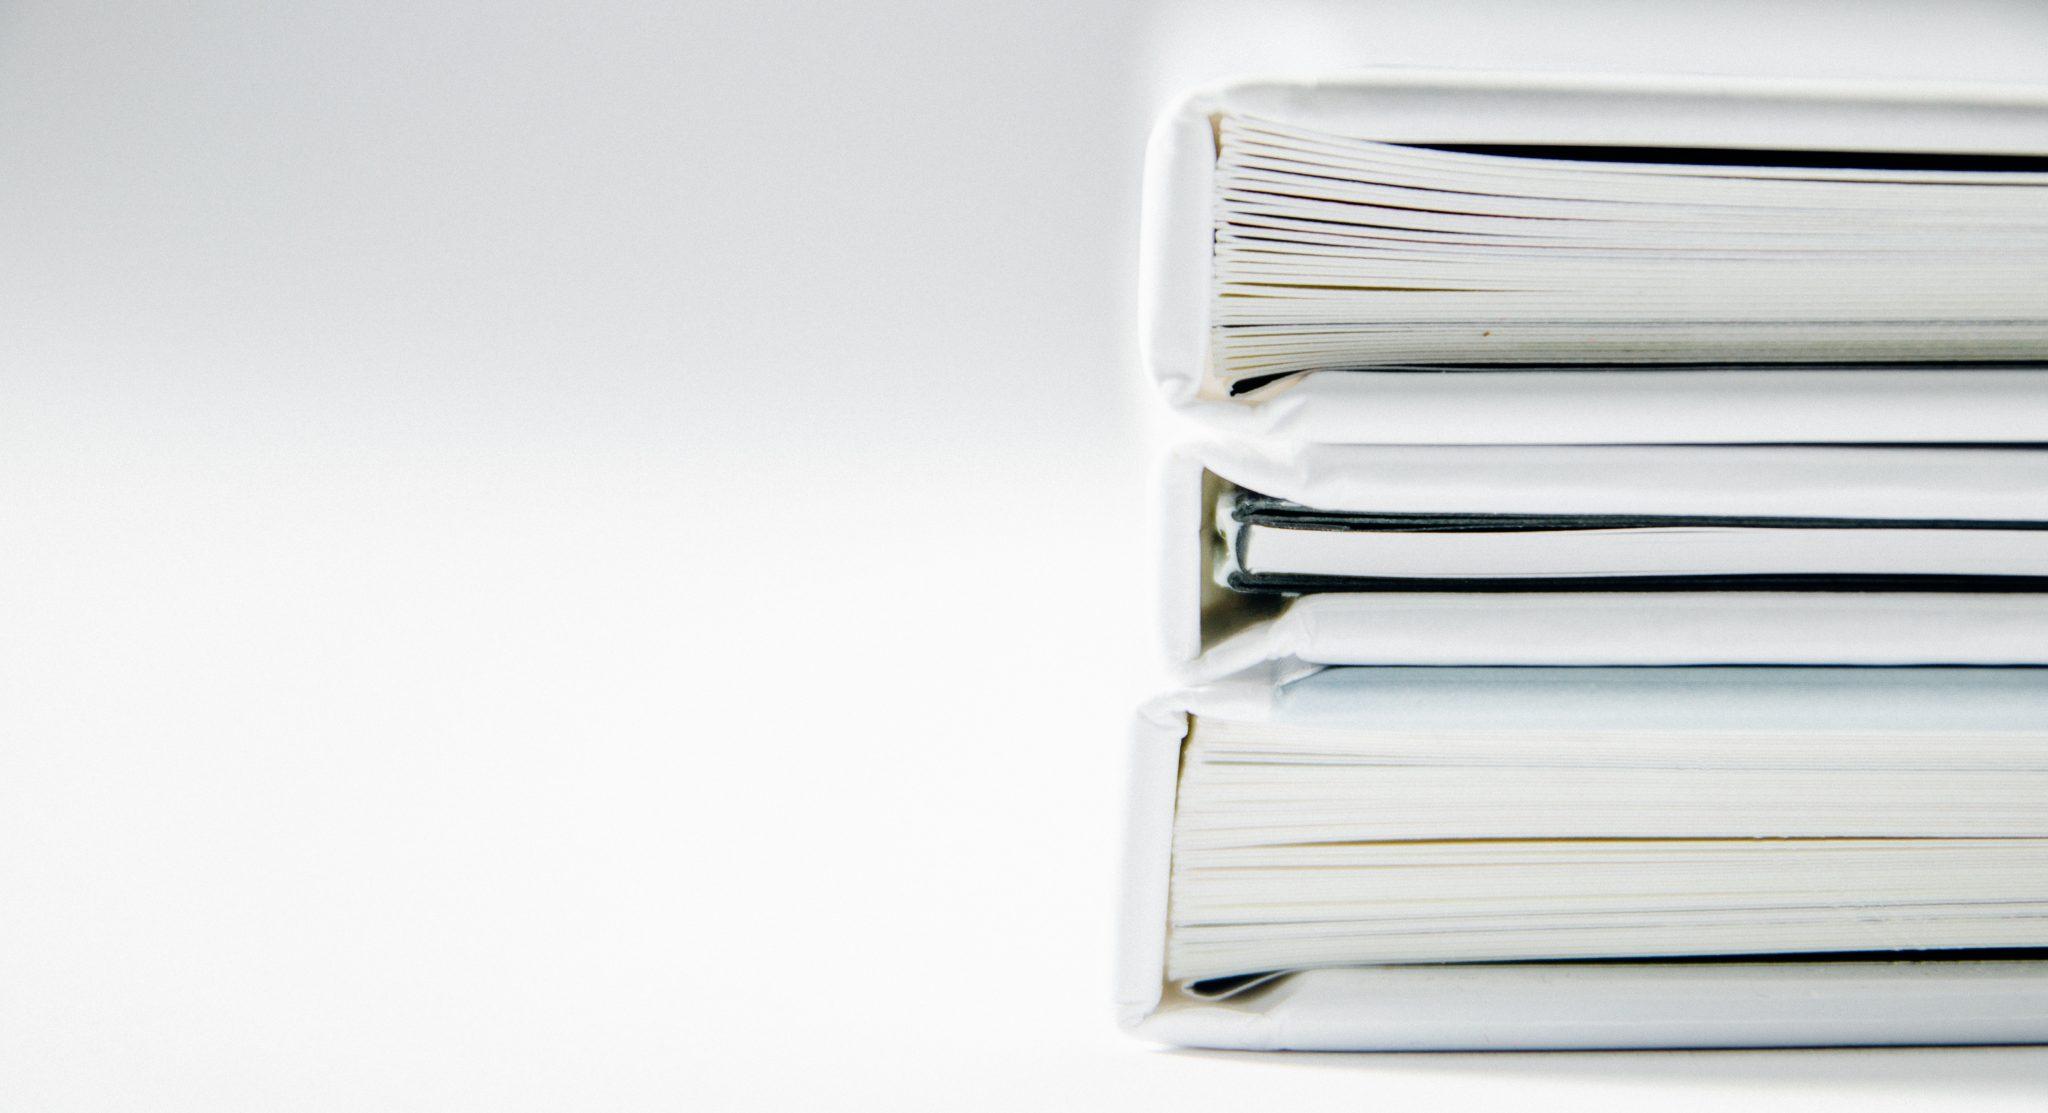 laporan, pembukuan, kertas